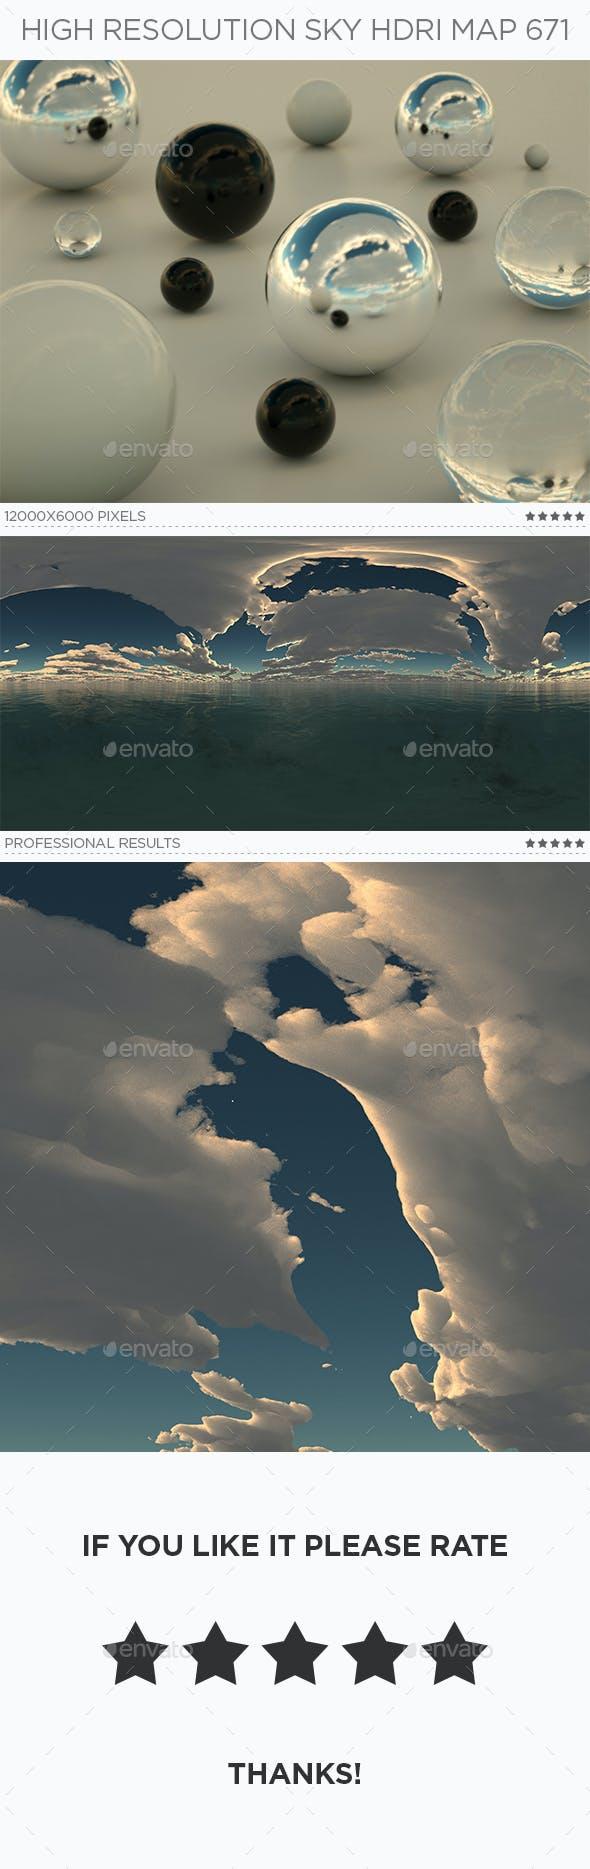 High Resolution Sky HDRi Map 671 - 3DOcean Item for Sale